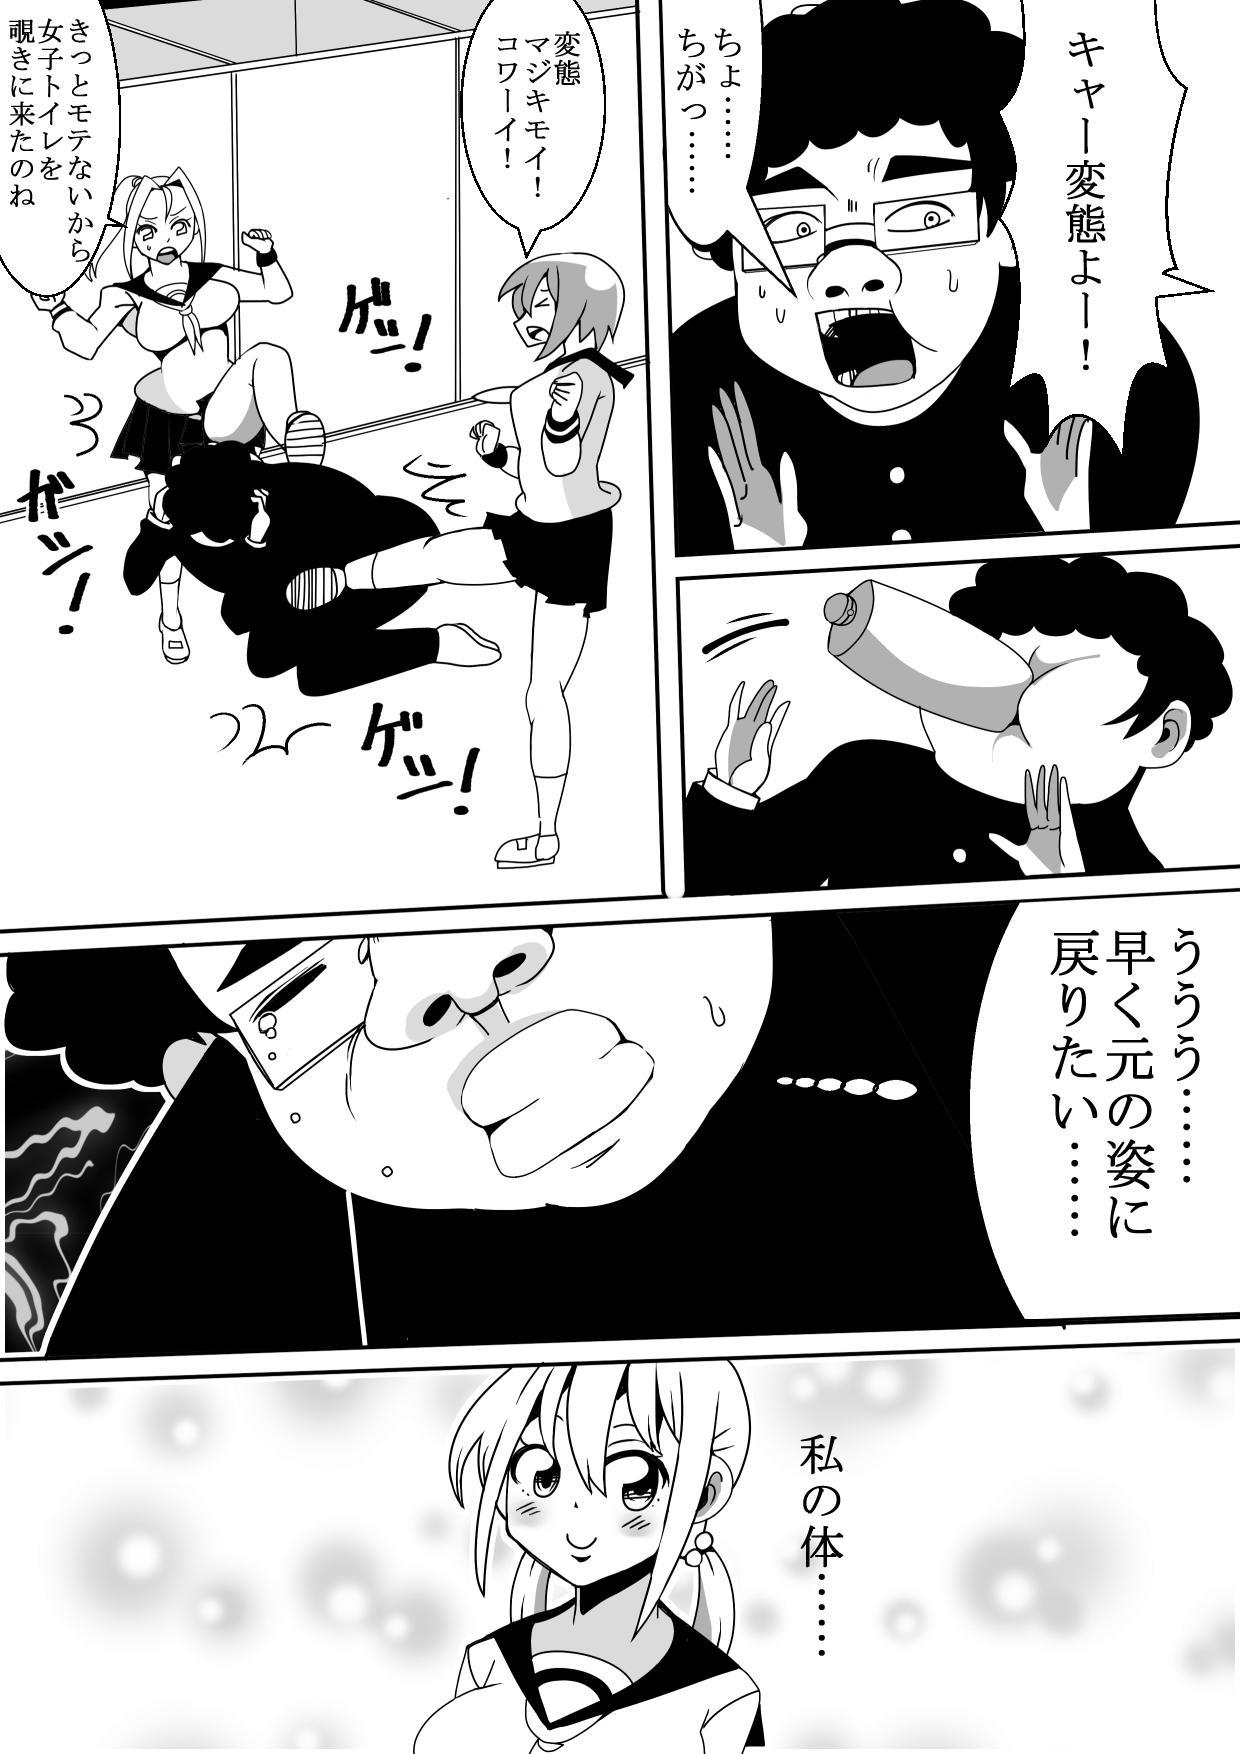 Kawaii JK to Kimoota ga Irekawari Sex 23